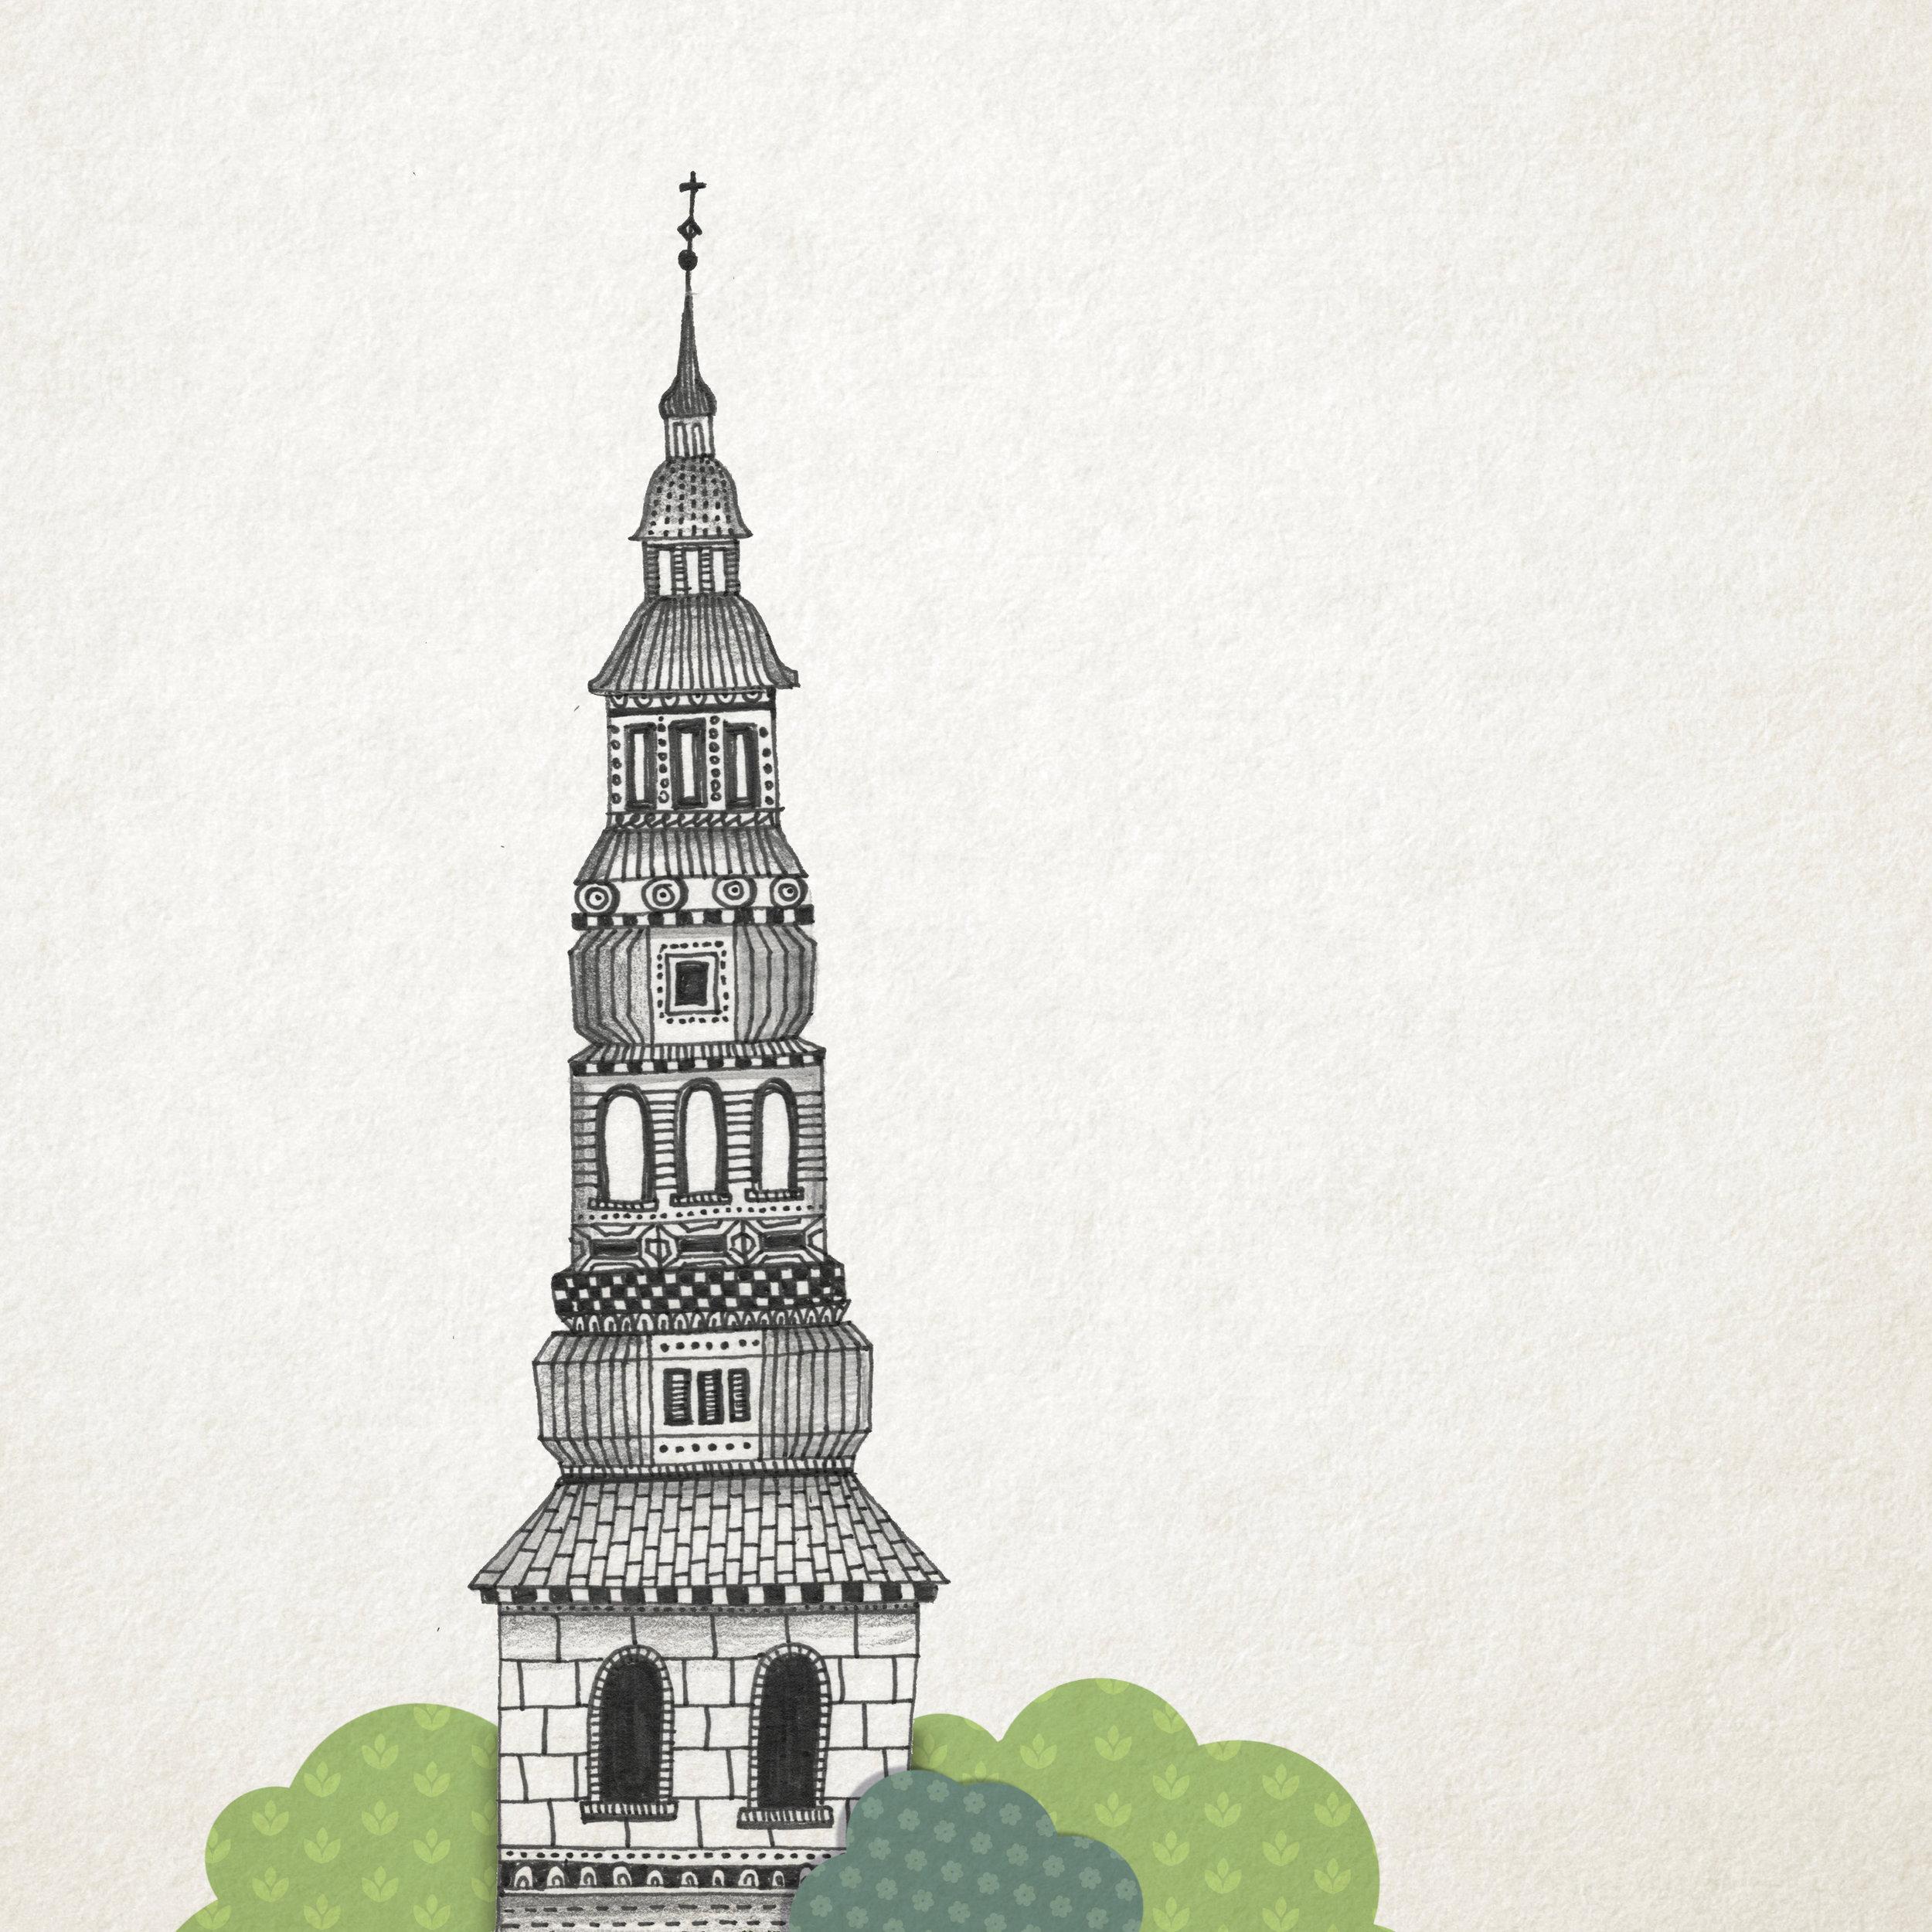 Church that's not a Church - Nikolaj Kunsthal